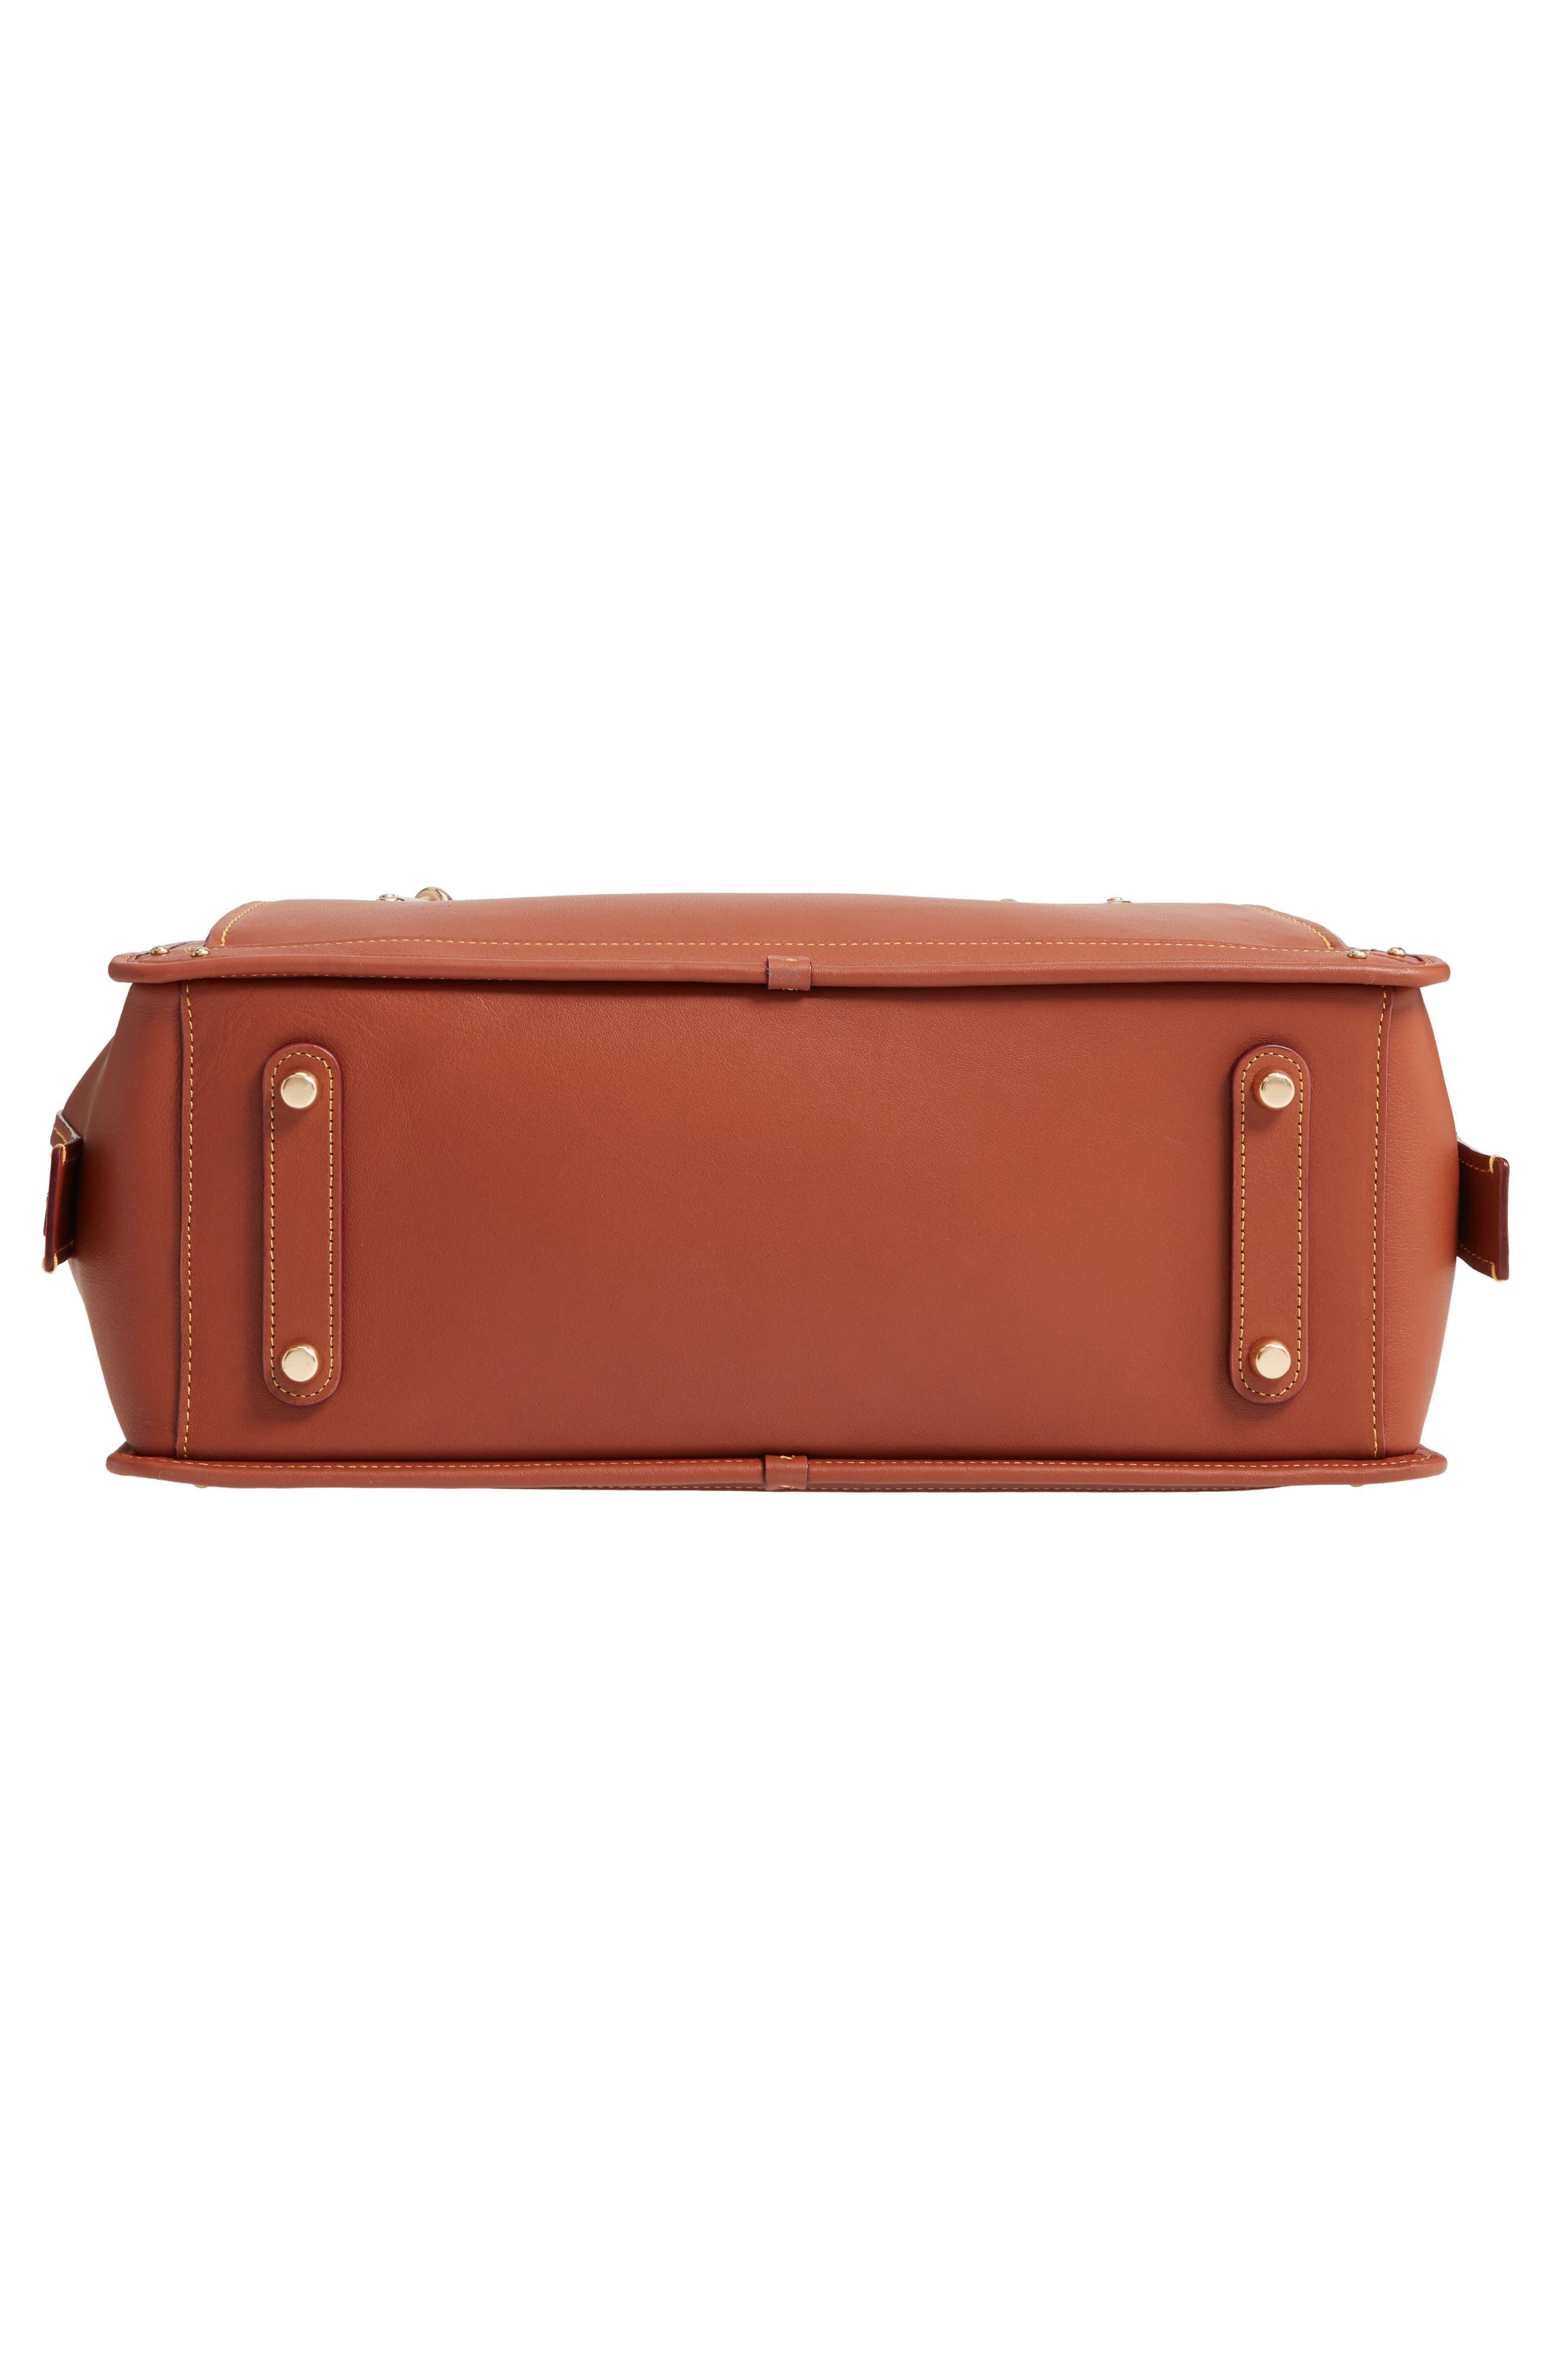 COACH,                             Dreamer 36 Leather Bag,                             Alternate thumbnail 6, color,                             LI/ 1941 SADDLE